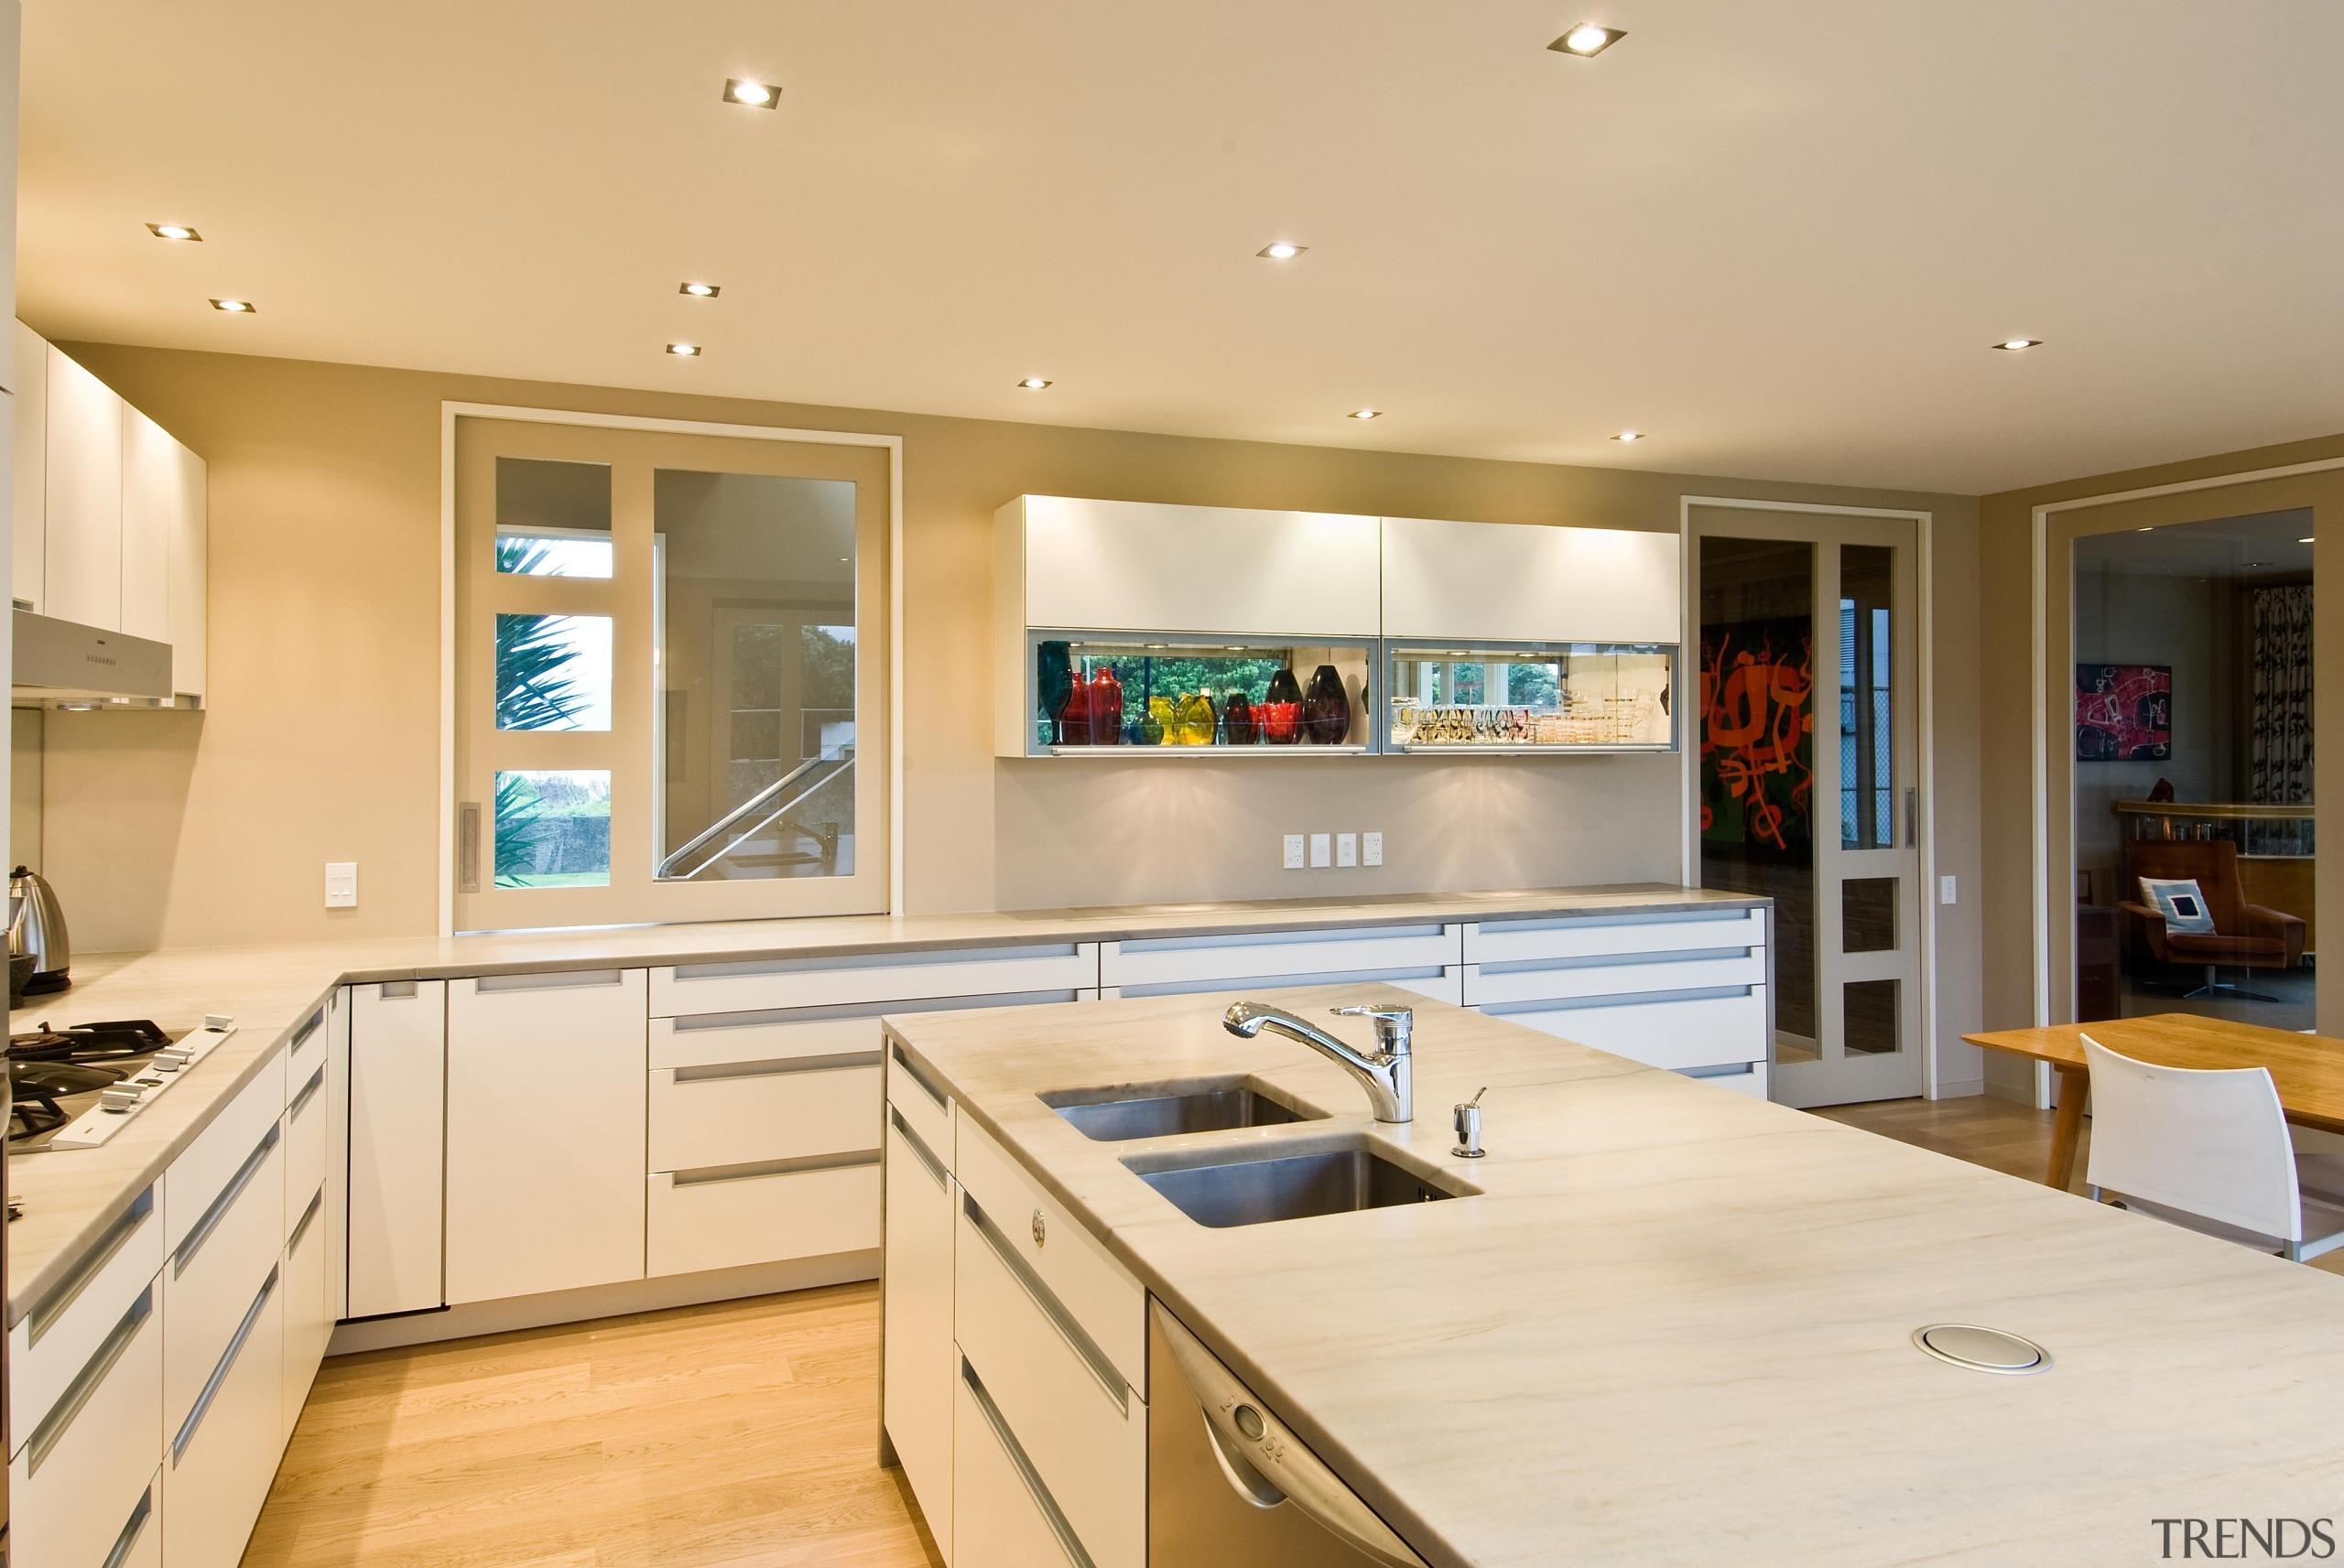 Paraparaumu Kitchen - Paraparaumu Kitchen - countertop | countertop, interior design, kitchen, real estate, room, orange